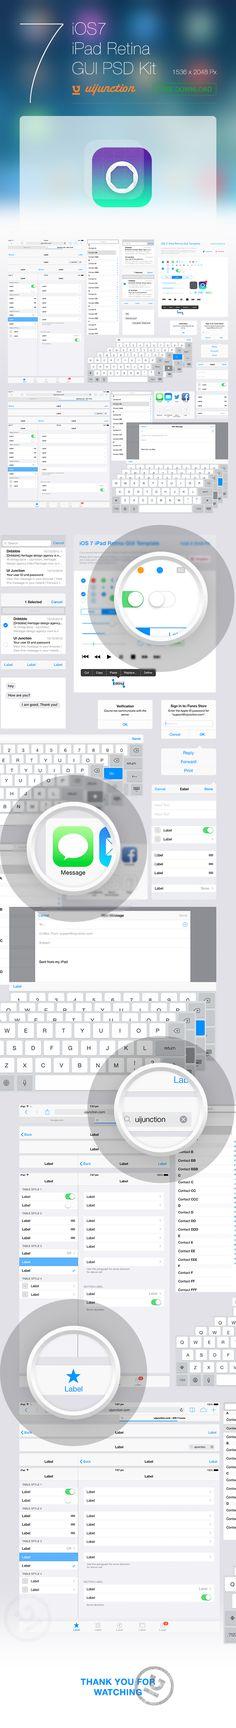 An awesome iOS 7 iPad Retina GUI Kit by Chirag via Behance